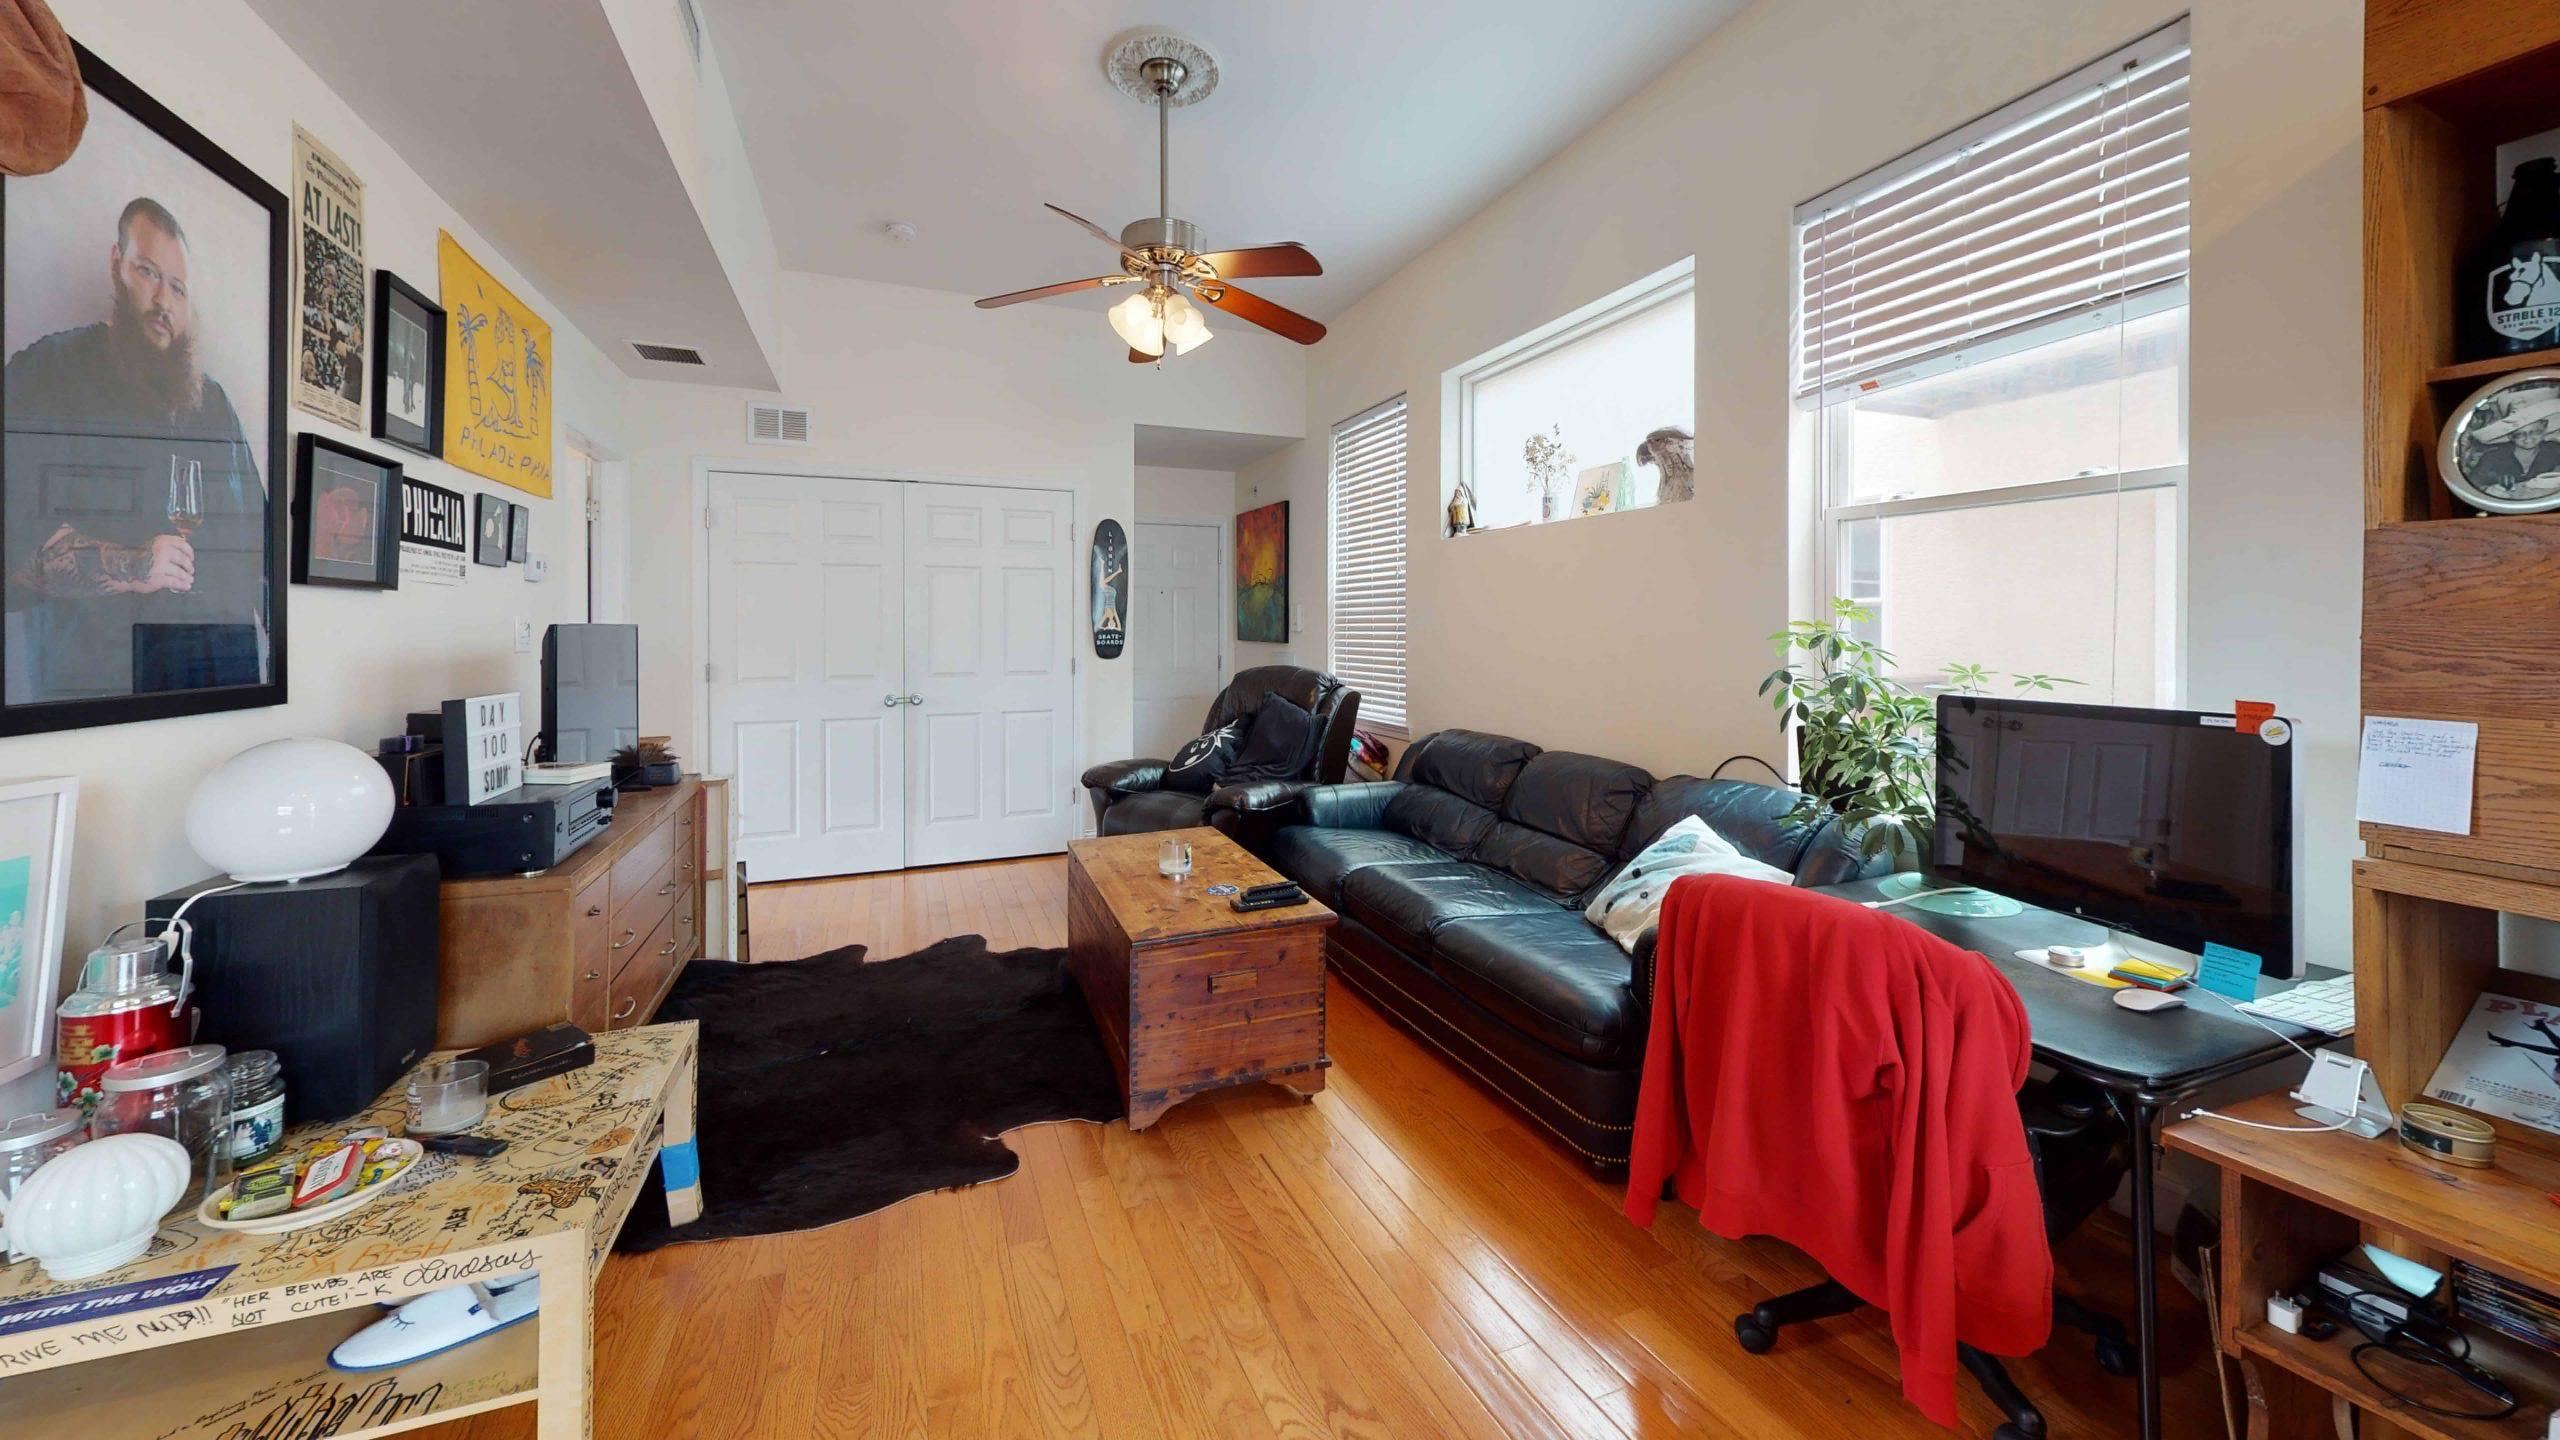 1521A Floor Rear Poplar Street Floor 2nd Philadelphia PA